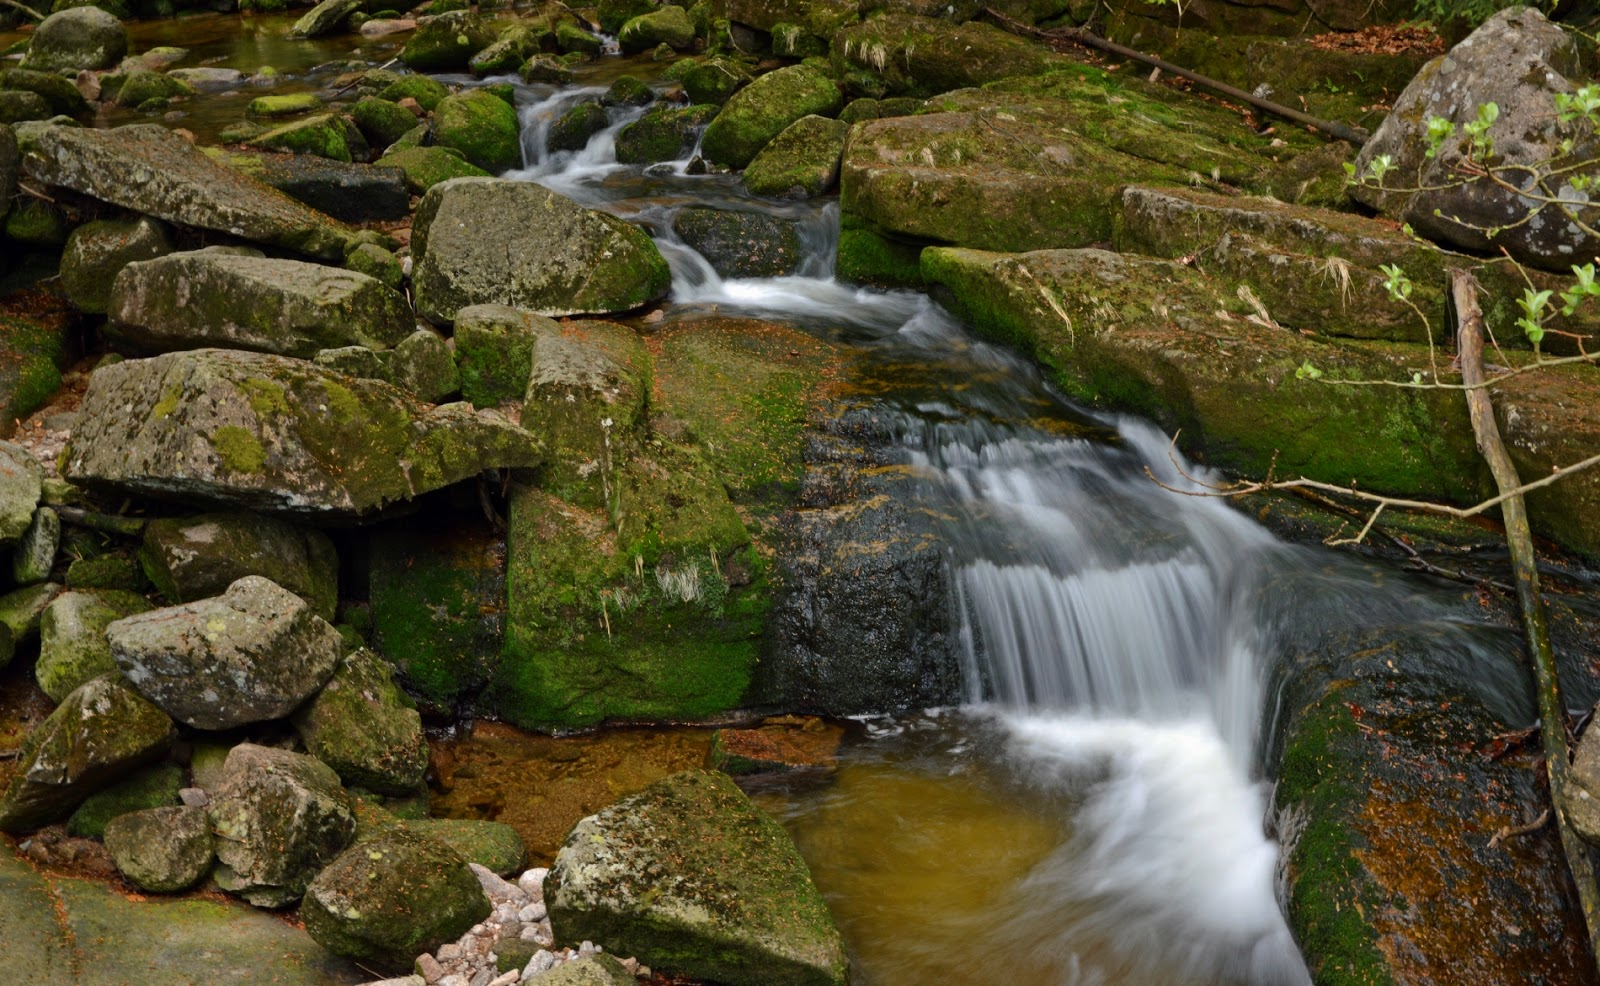 Potok Kamieńczyk Karkonosze